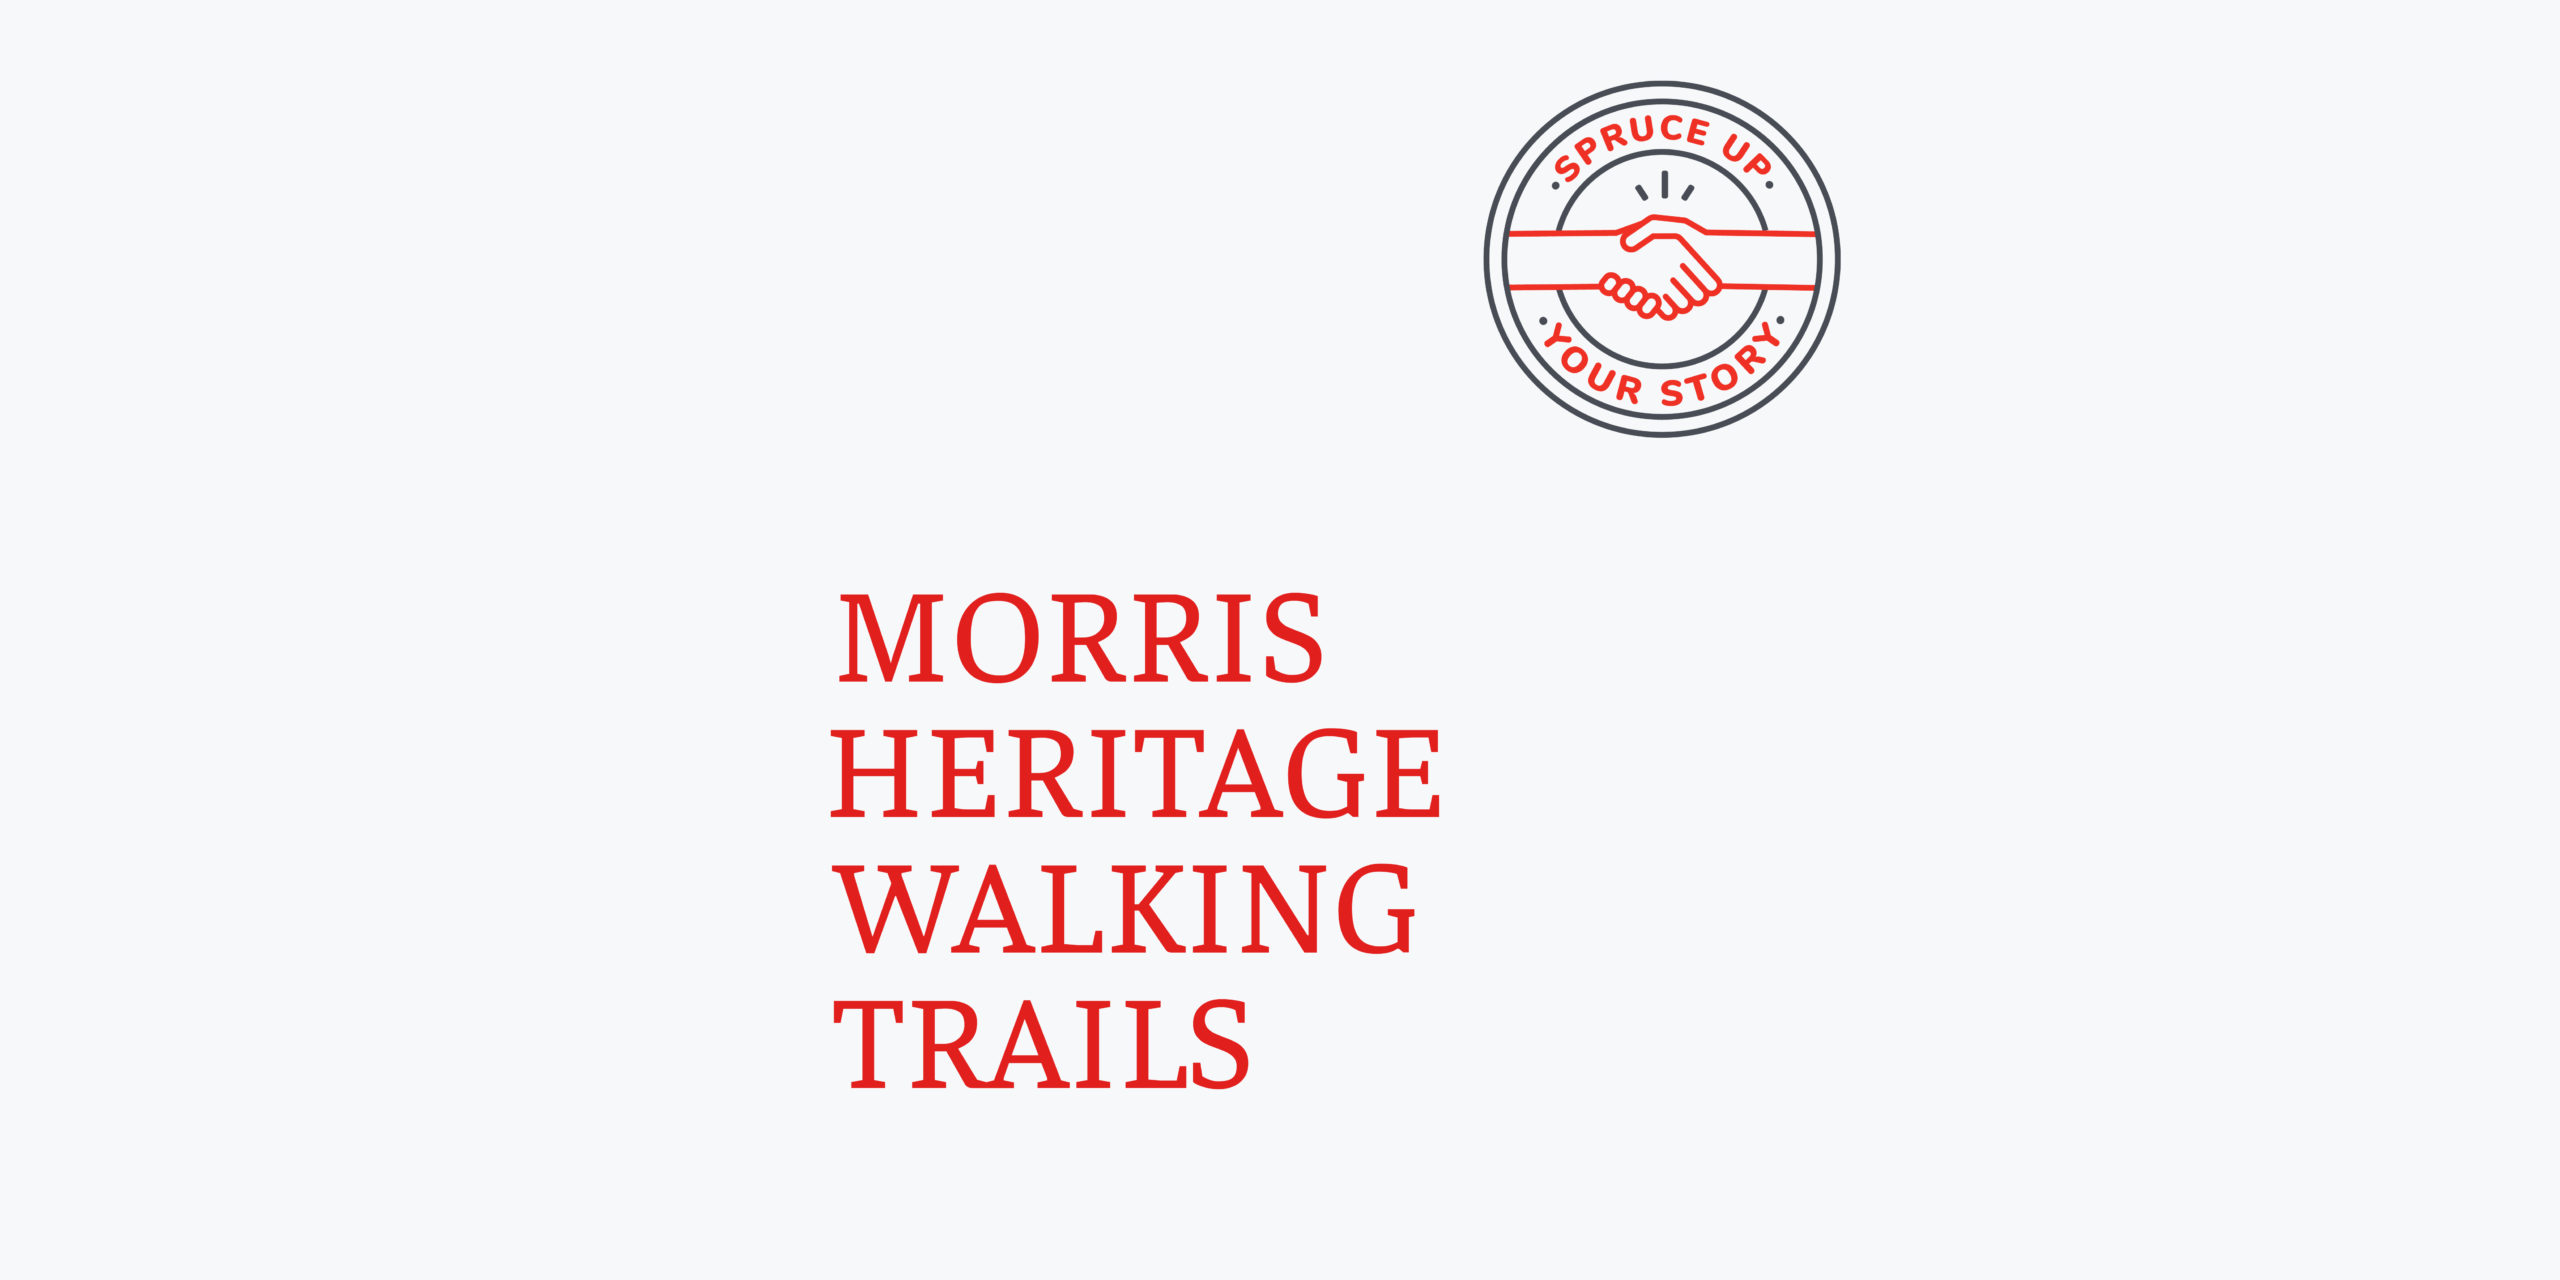 Morris Heritage Walking Trails